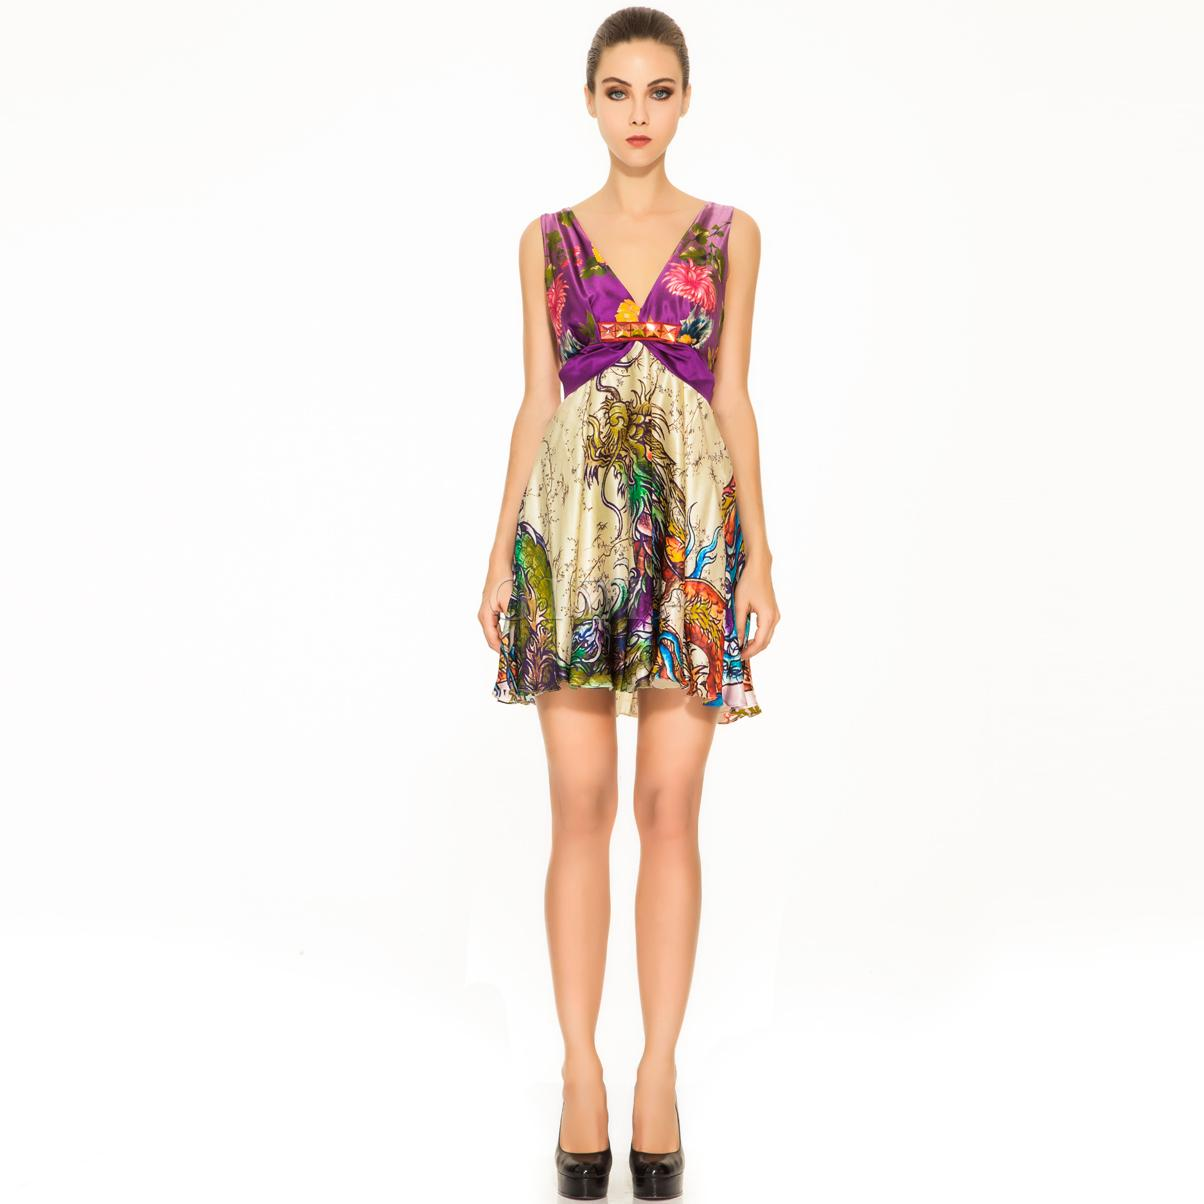 Gizia Desenli Kısa Elbise